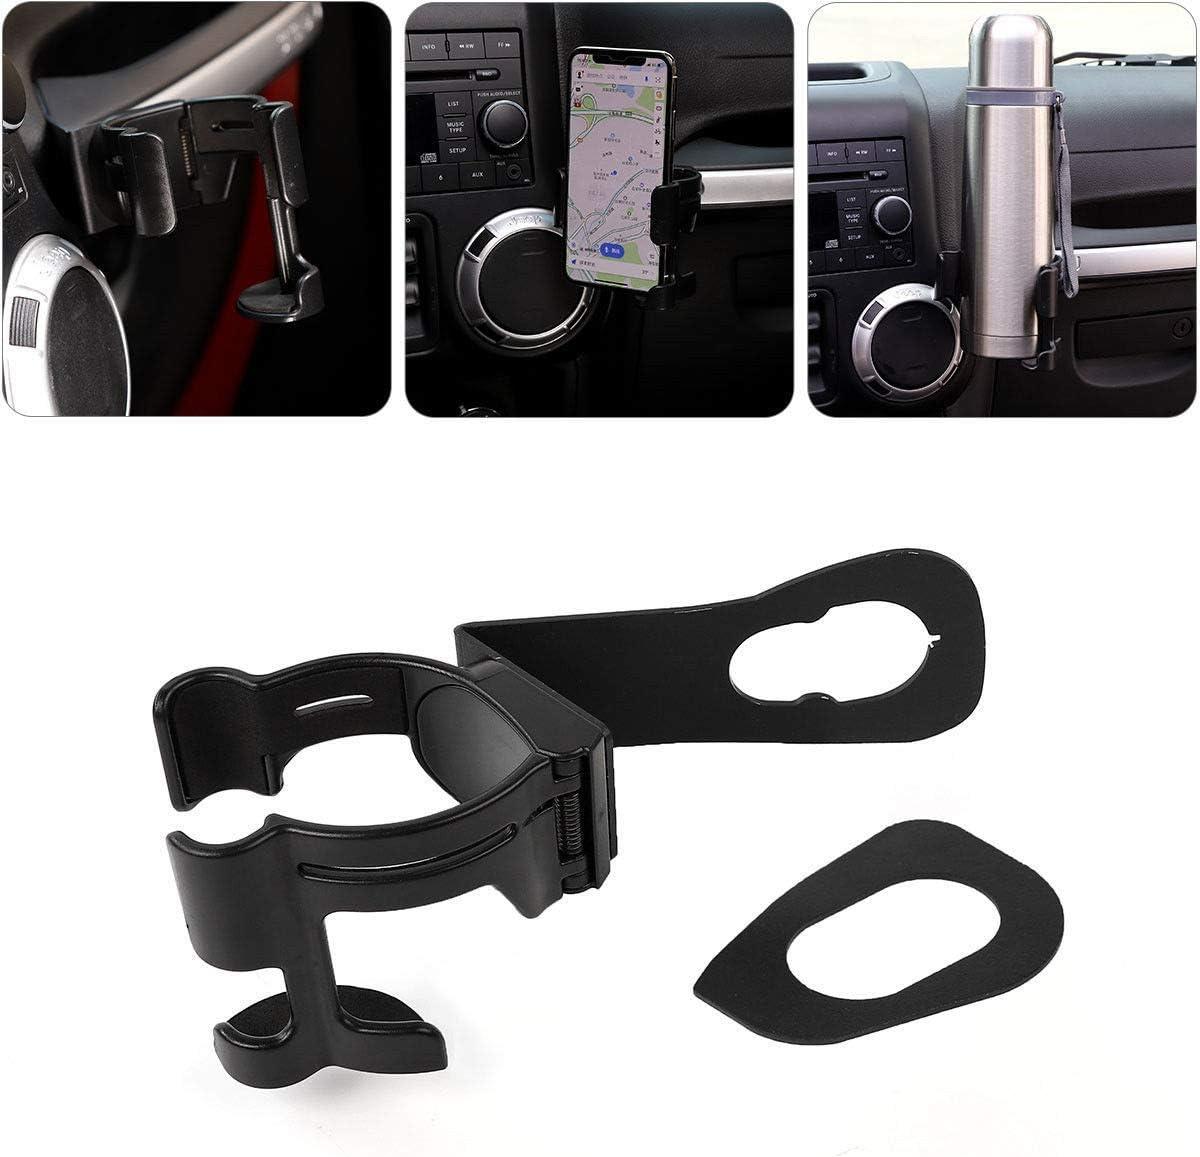 Black Car Cup Cellphone Holder Drinks Holder Glove Spacer Shelf 3 in 1